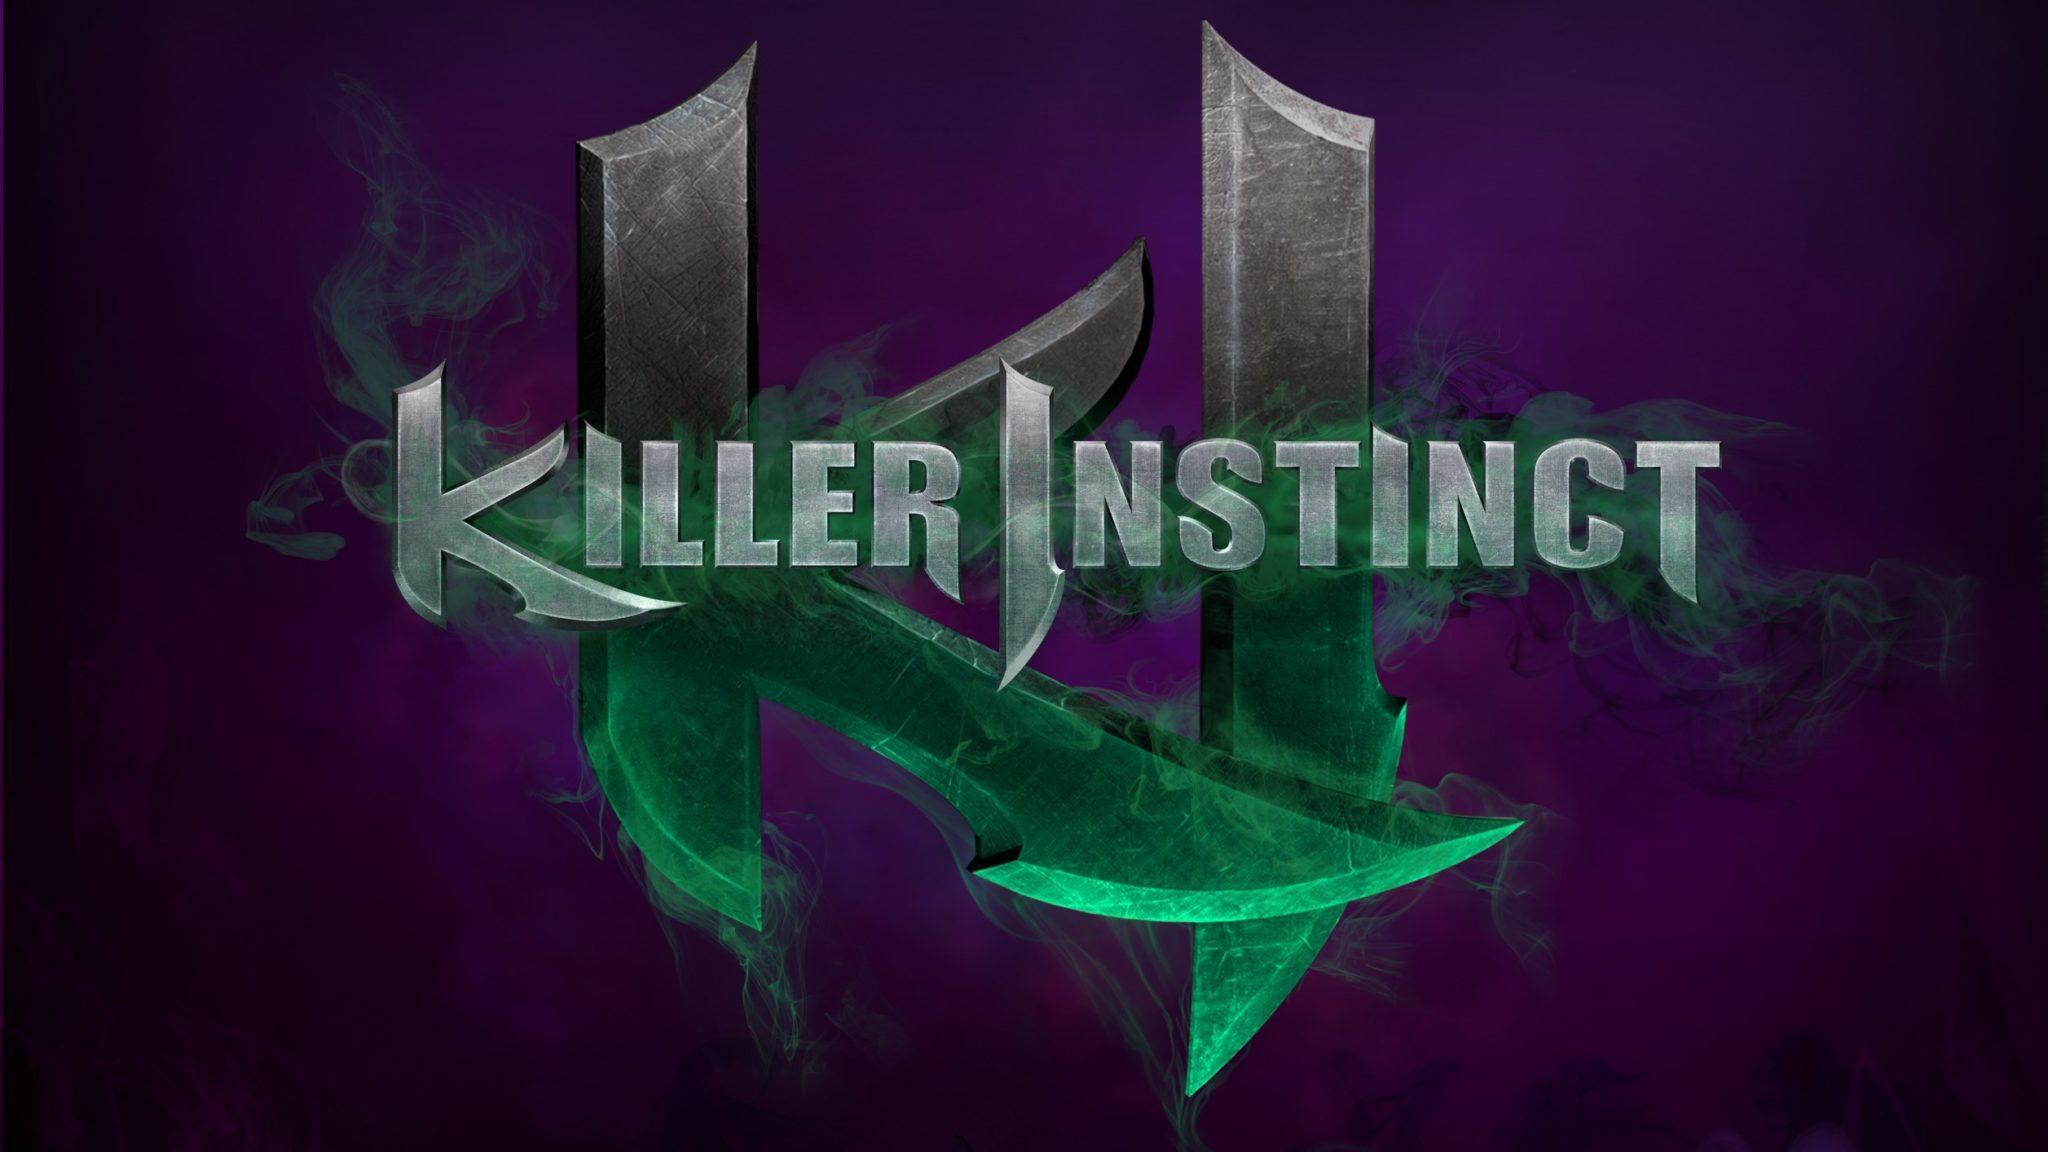 Killer instinct pc release date